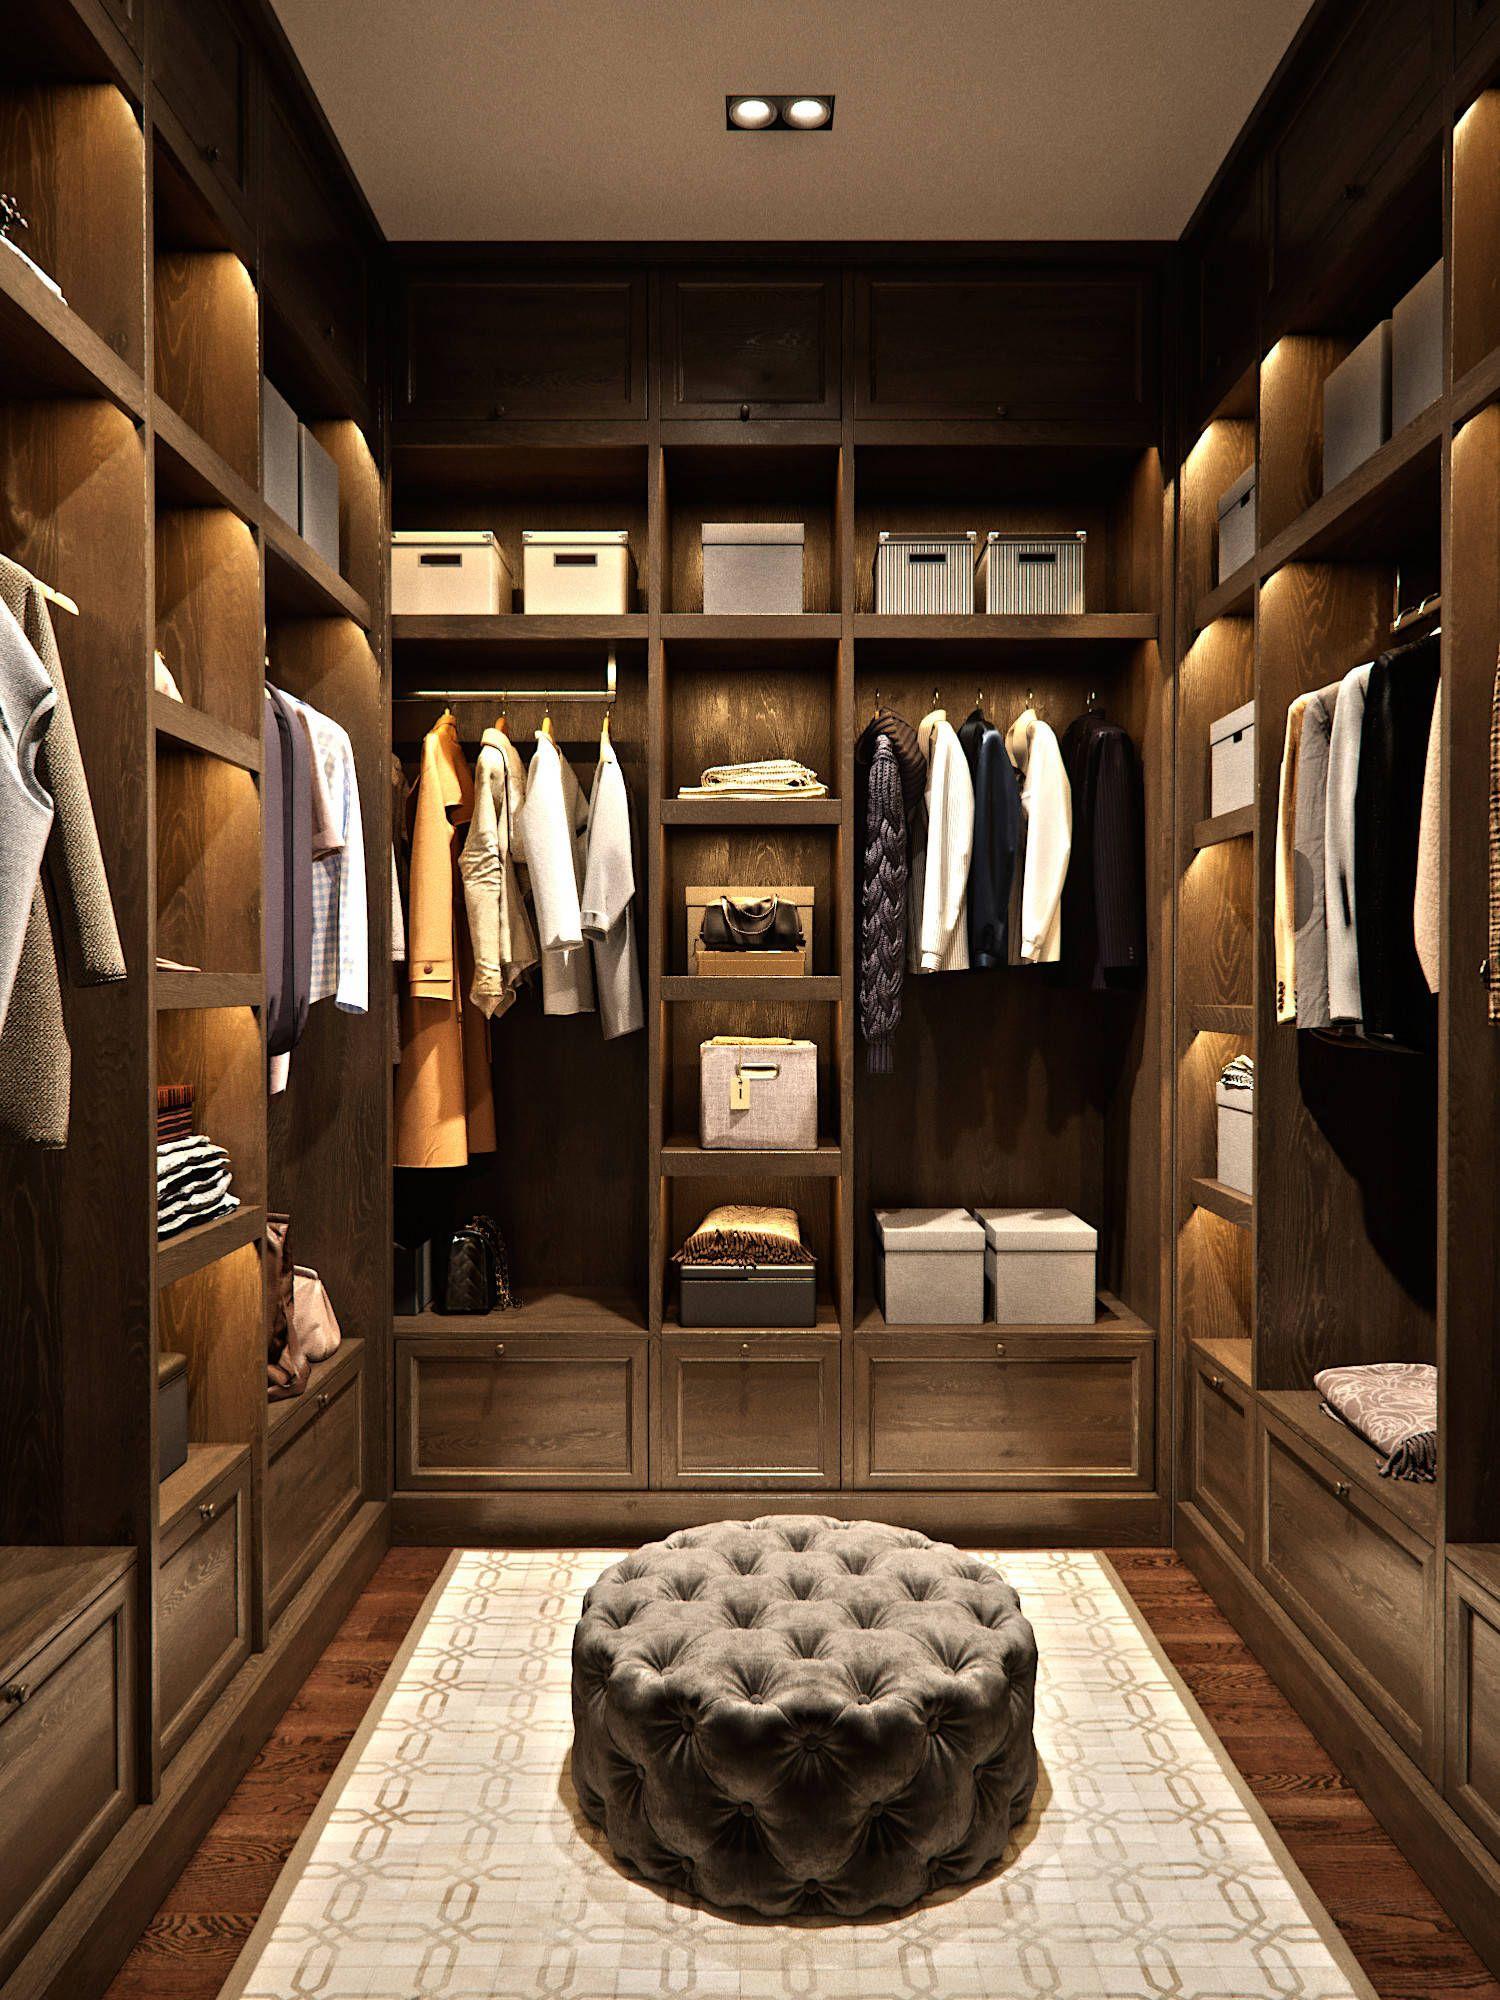 19 Wonderful Walk-In Closets (Photo Gallery)